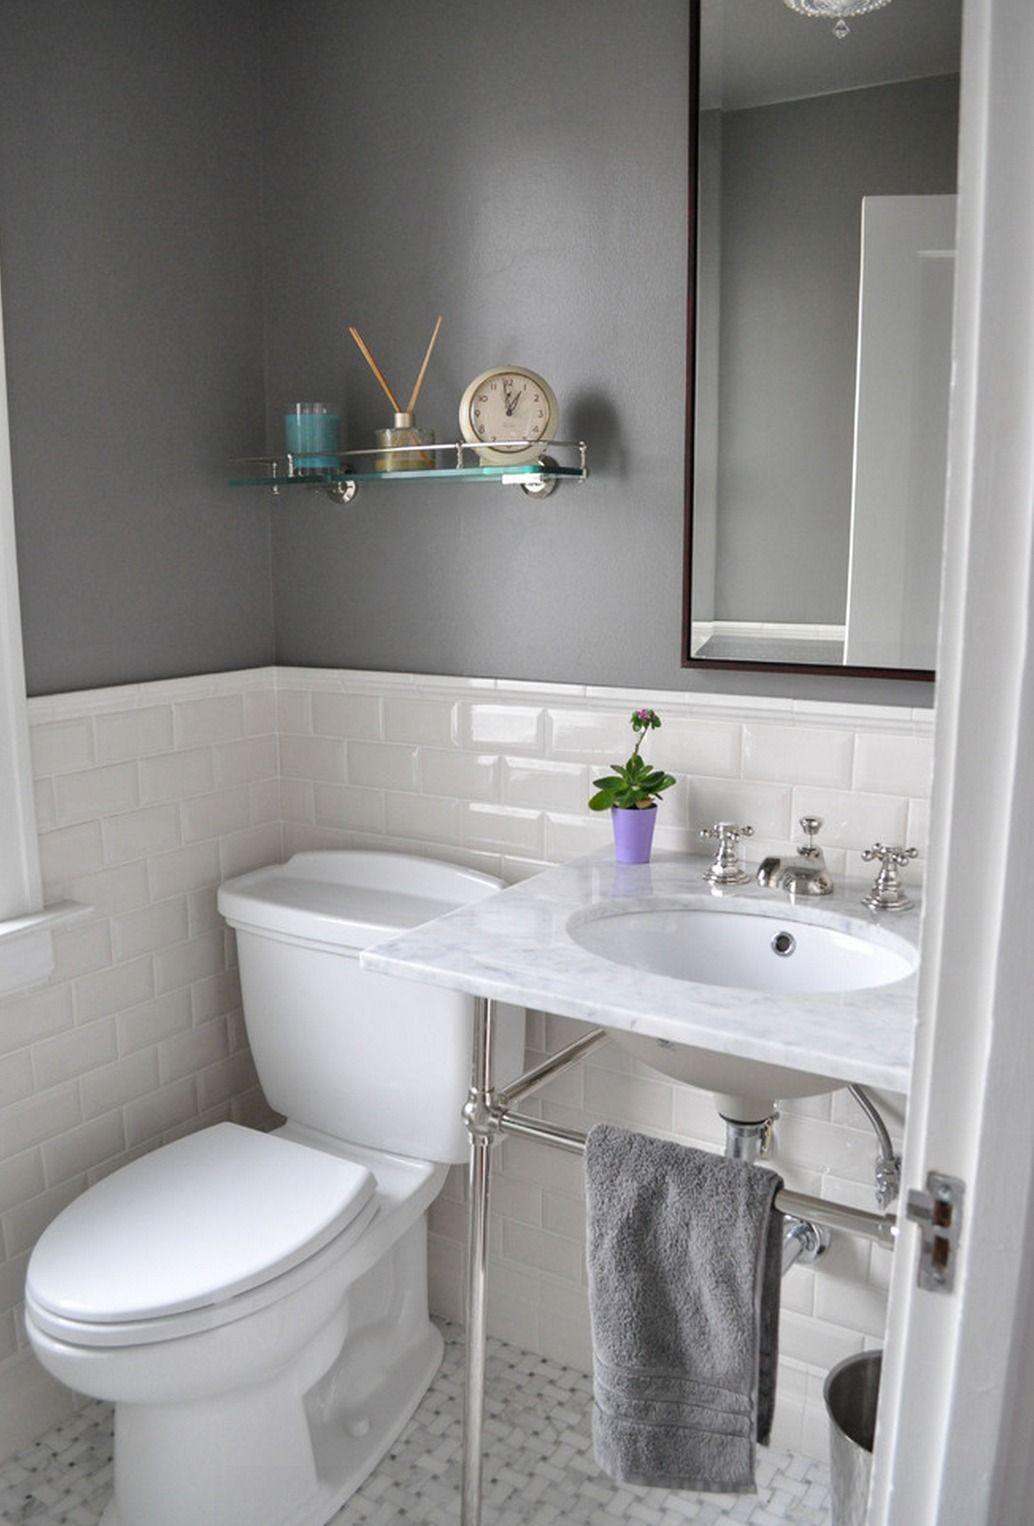 6 Timeless Traditional Bathroom Ideas Houseminds Traditional Bathroom Bathroom Design Small Small Space Bathroom Design